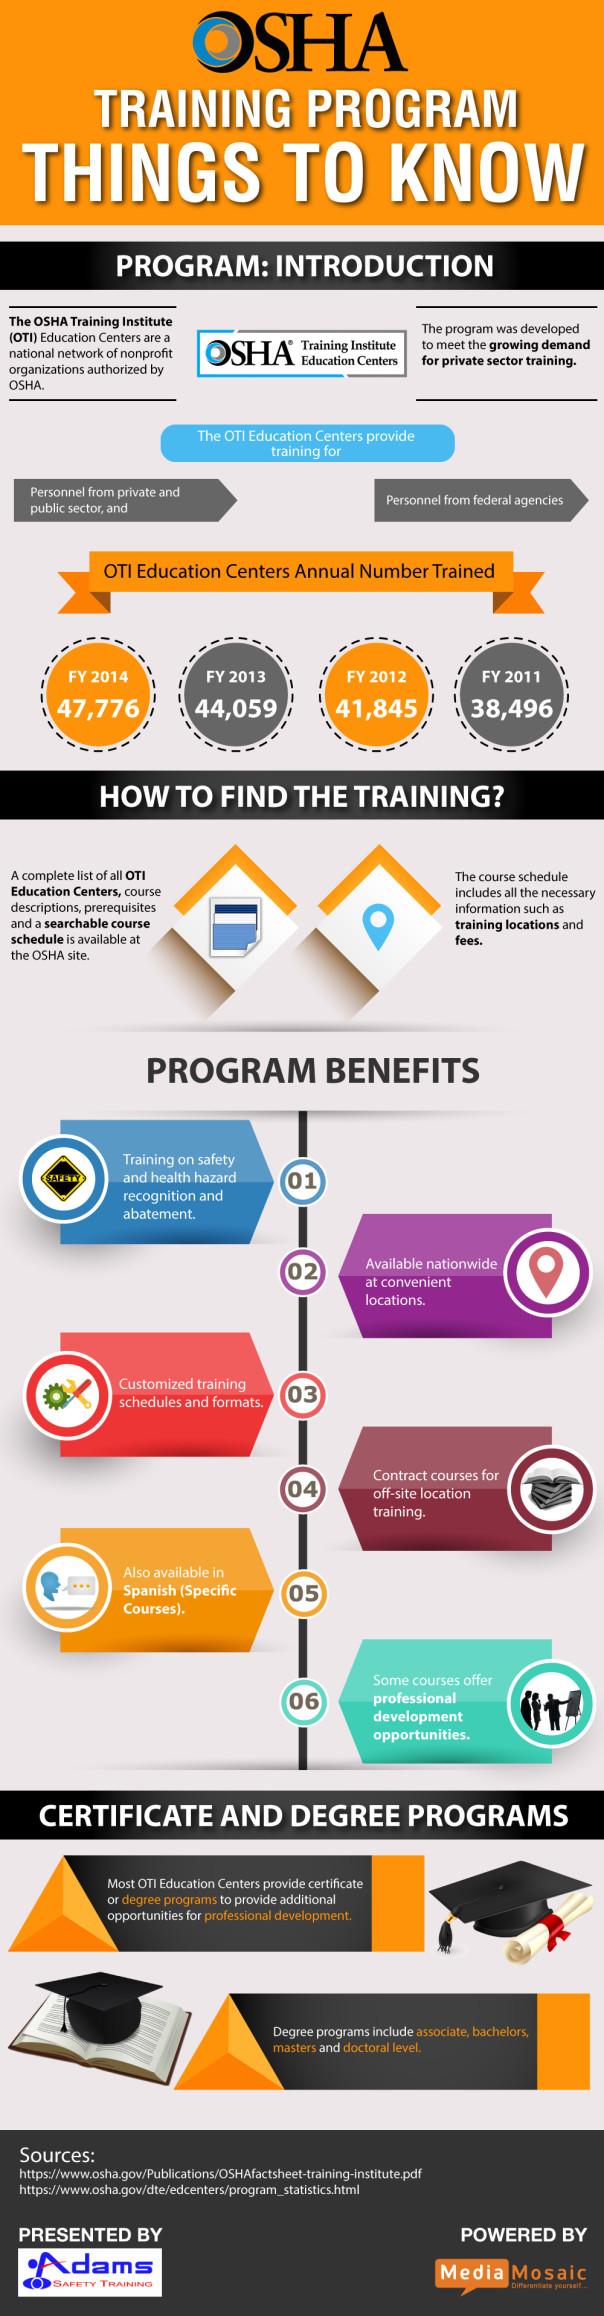 OSHA Training Program : Things to Know